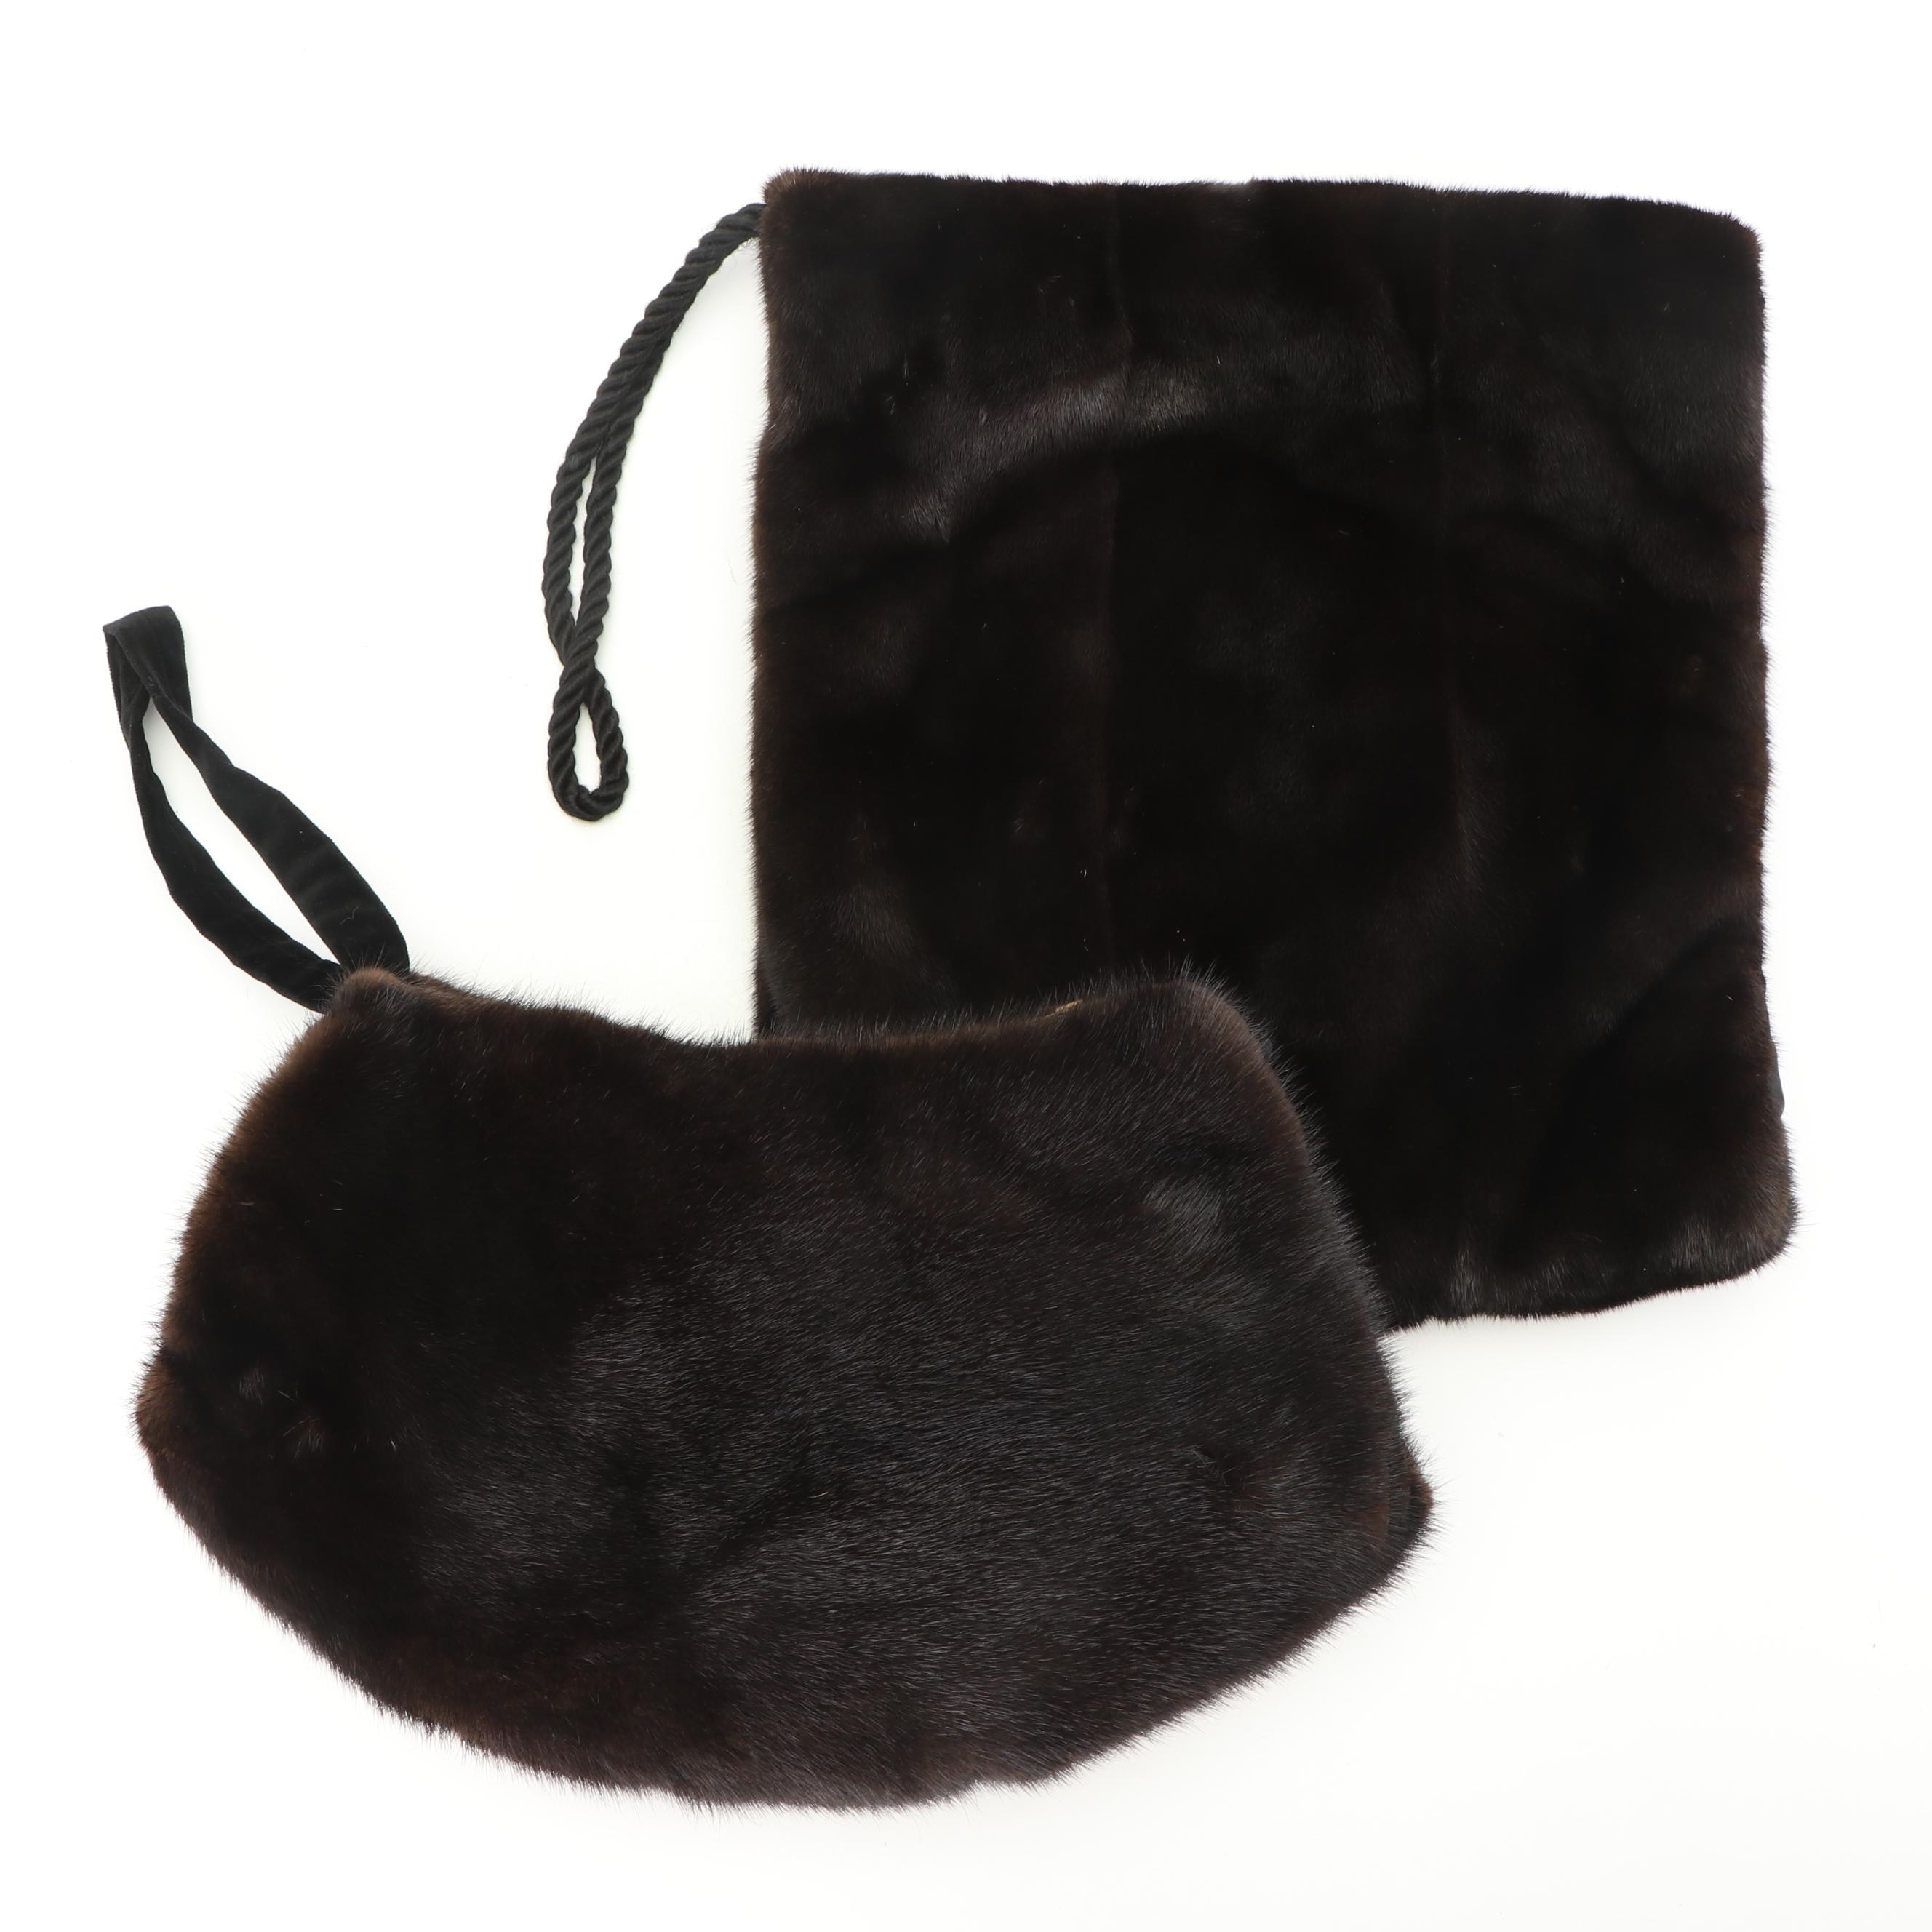 Mink Fur Muffs with Neiman Marcus Hat Box, Mid-20th Century